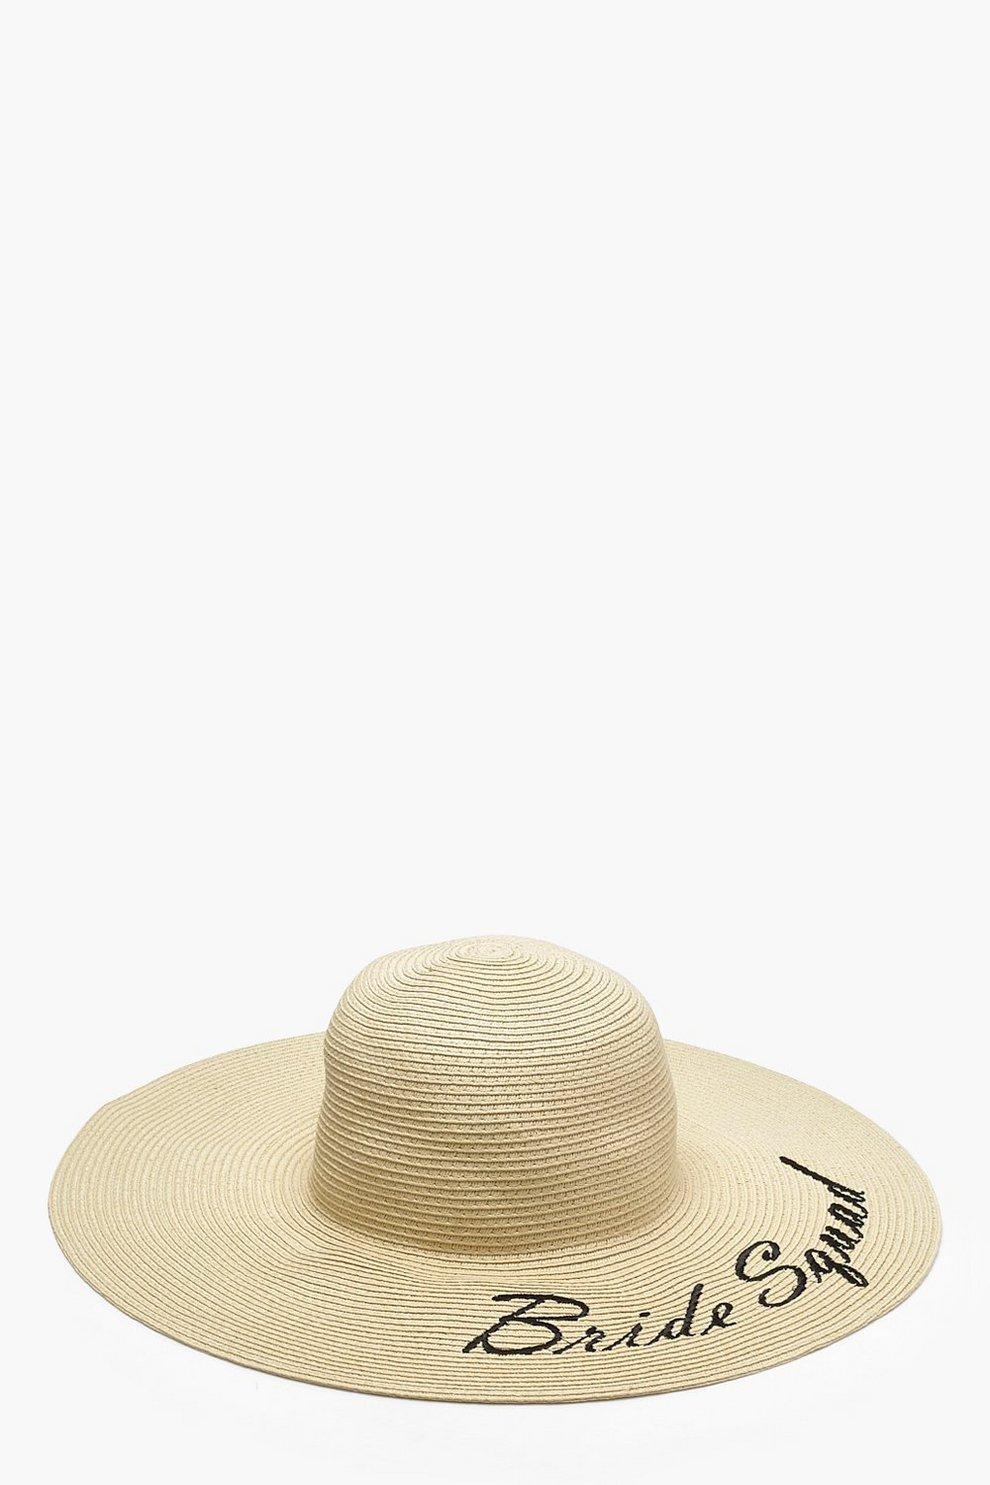 0b9c323b11f72 Bride Squad Slogan Straw Floppy Hat